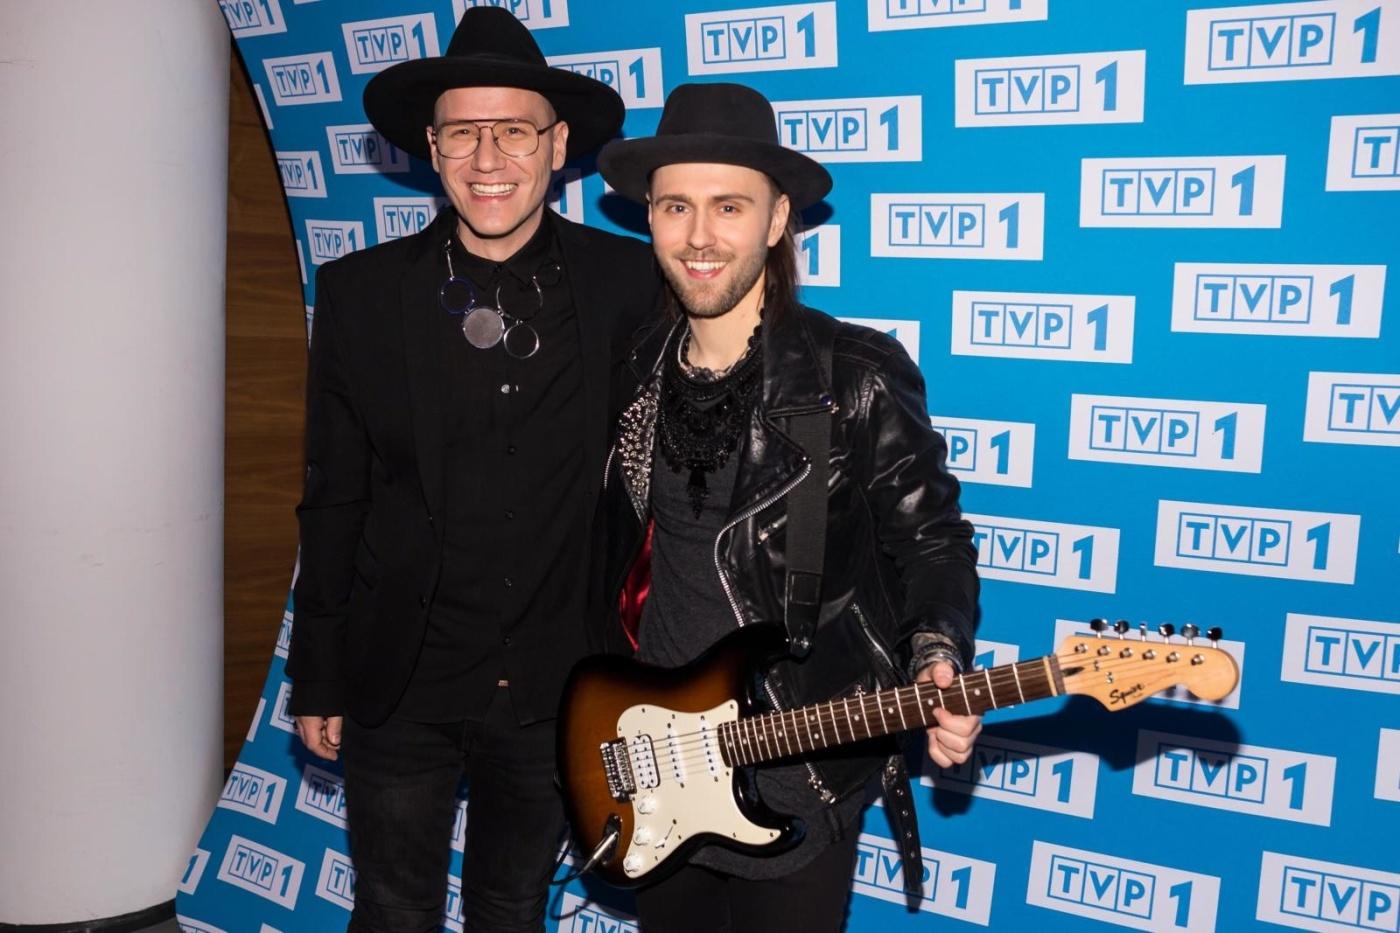 Gromee and Lukas Meijer